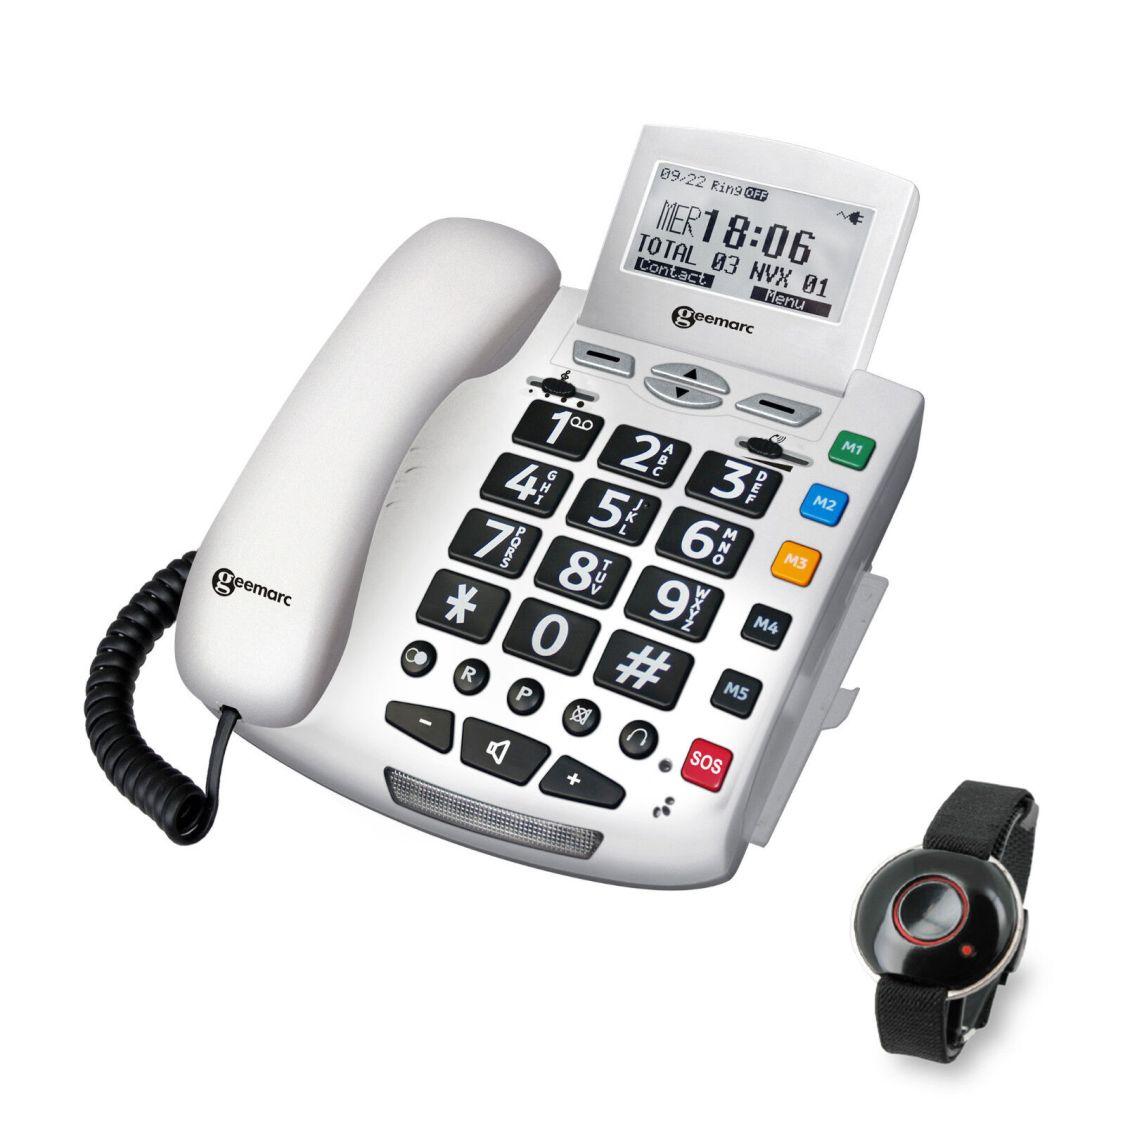 Sprechendes Notruf-Telefon & SOS Funk-Armband Geemarc Serenities Notrufarmband